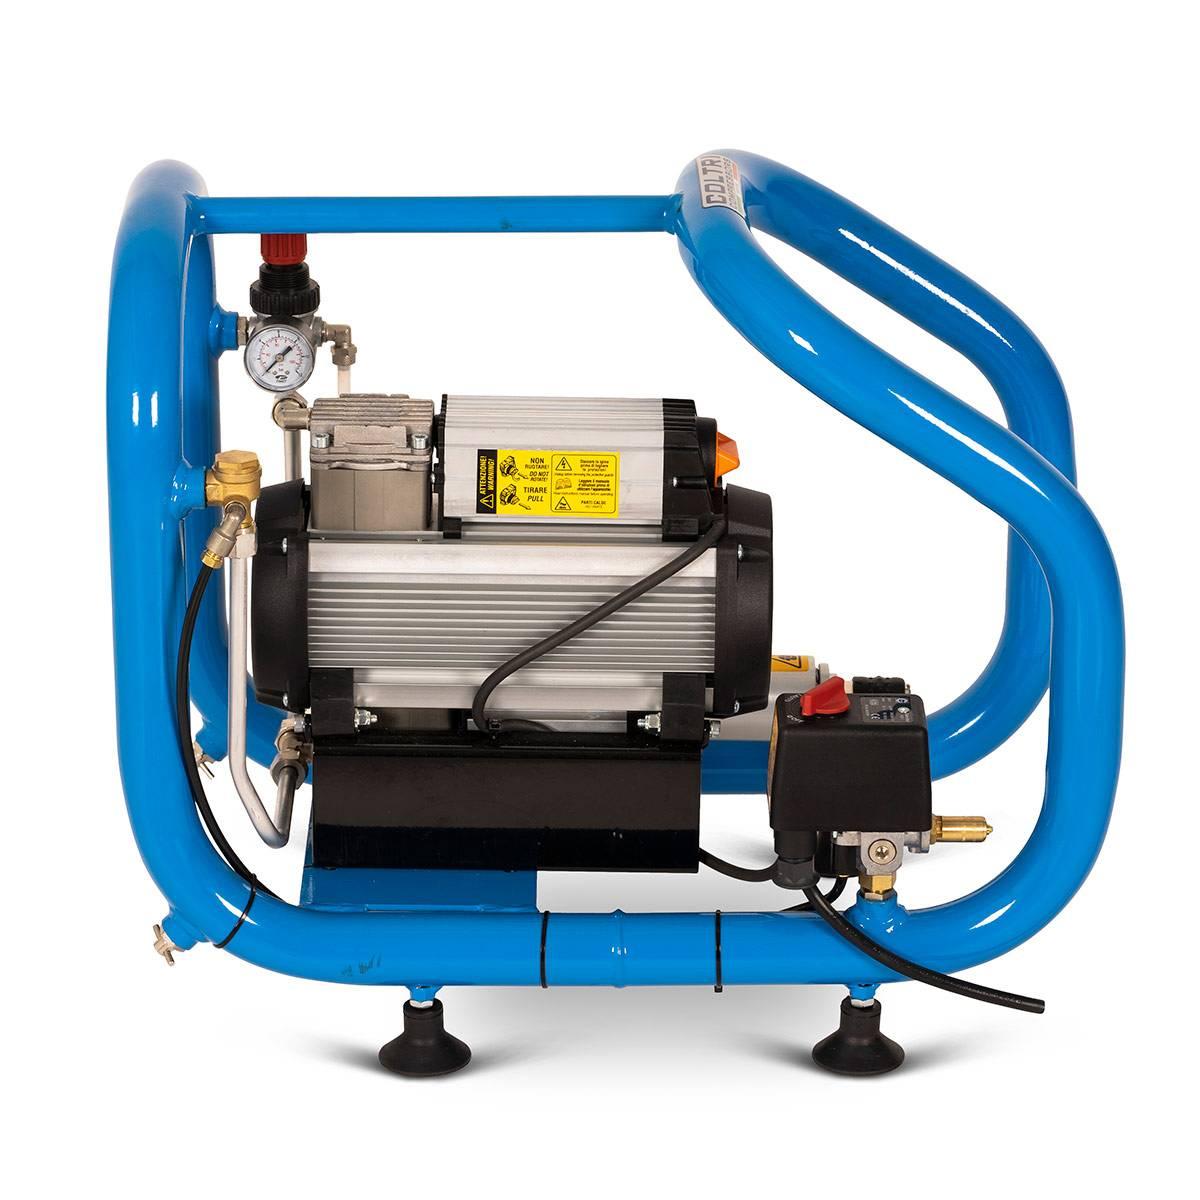 Електрически водолазен компресор тип Наргеле ТESEO EM THIRD LUNG COMPRESSOR 10 бара – Coltri